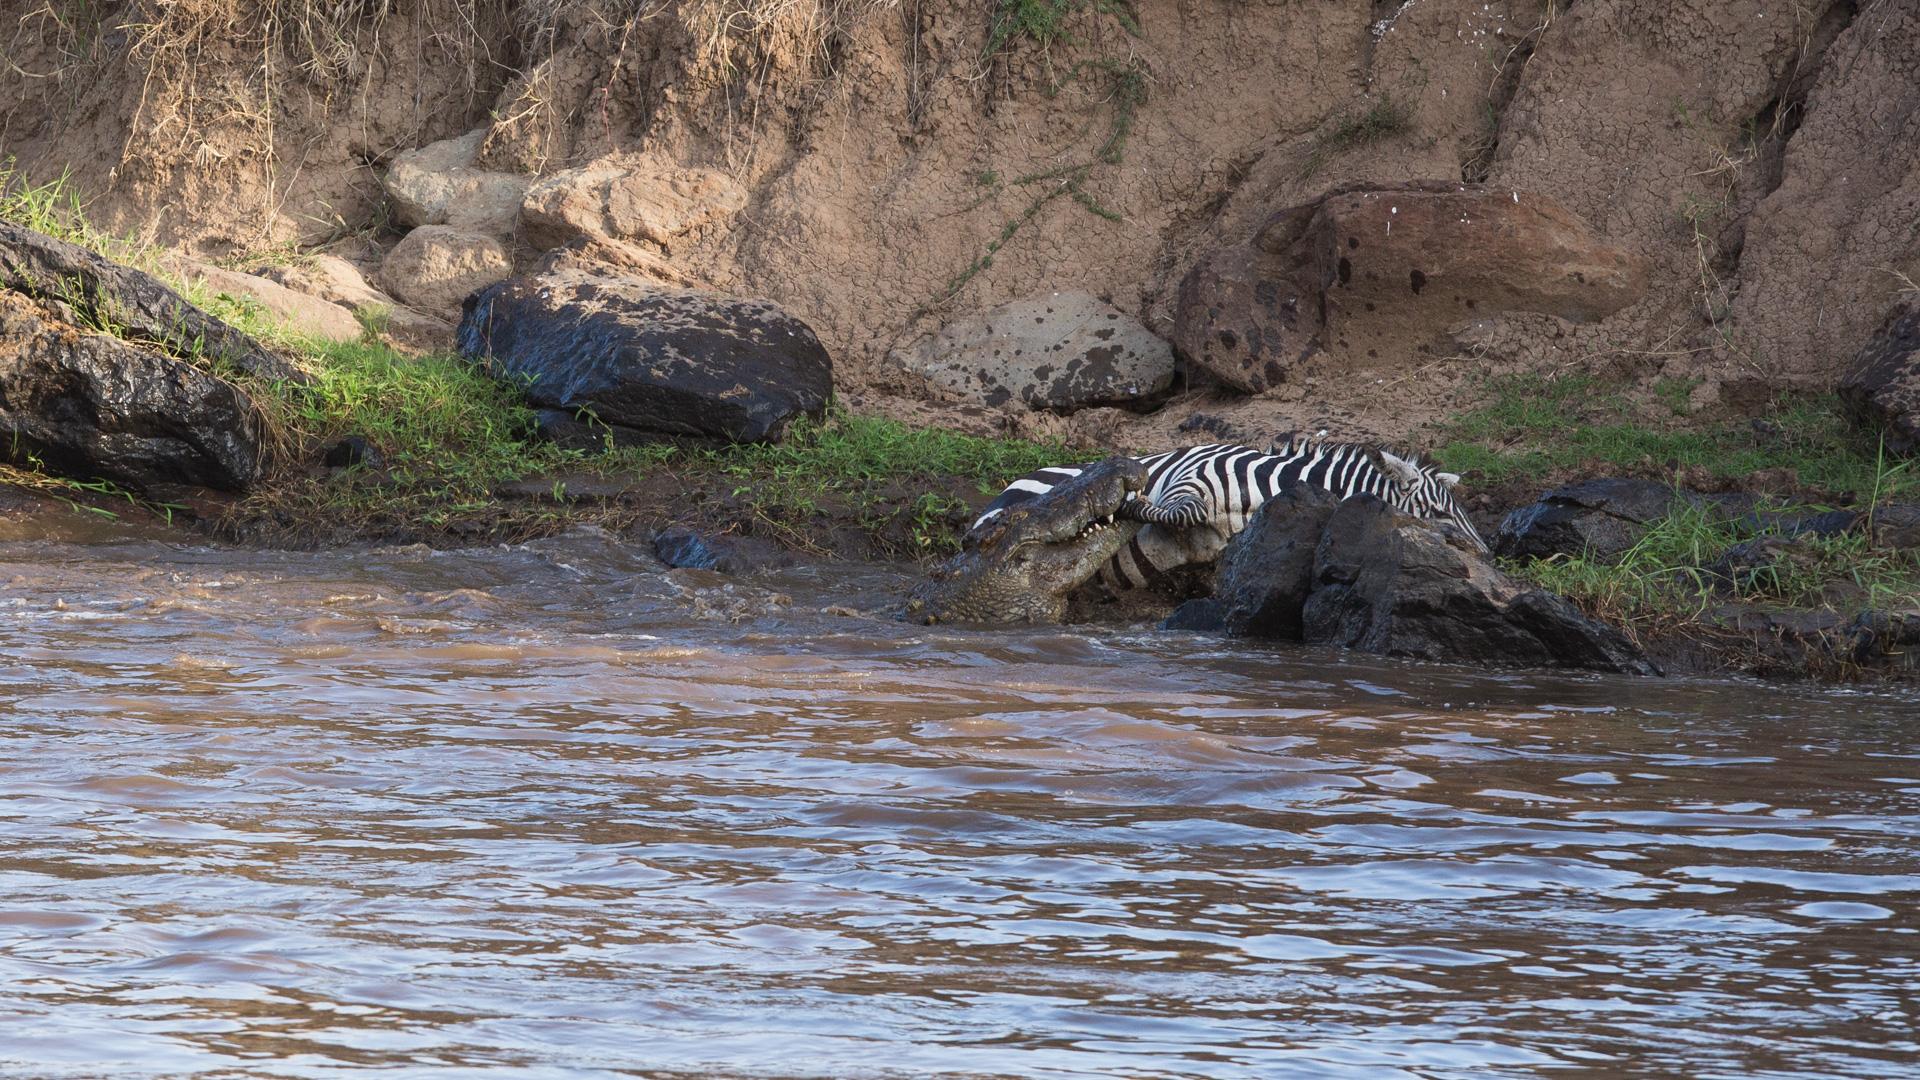 Crocodiles take down zebra